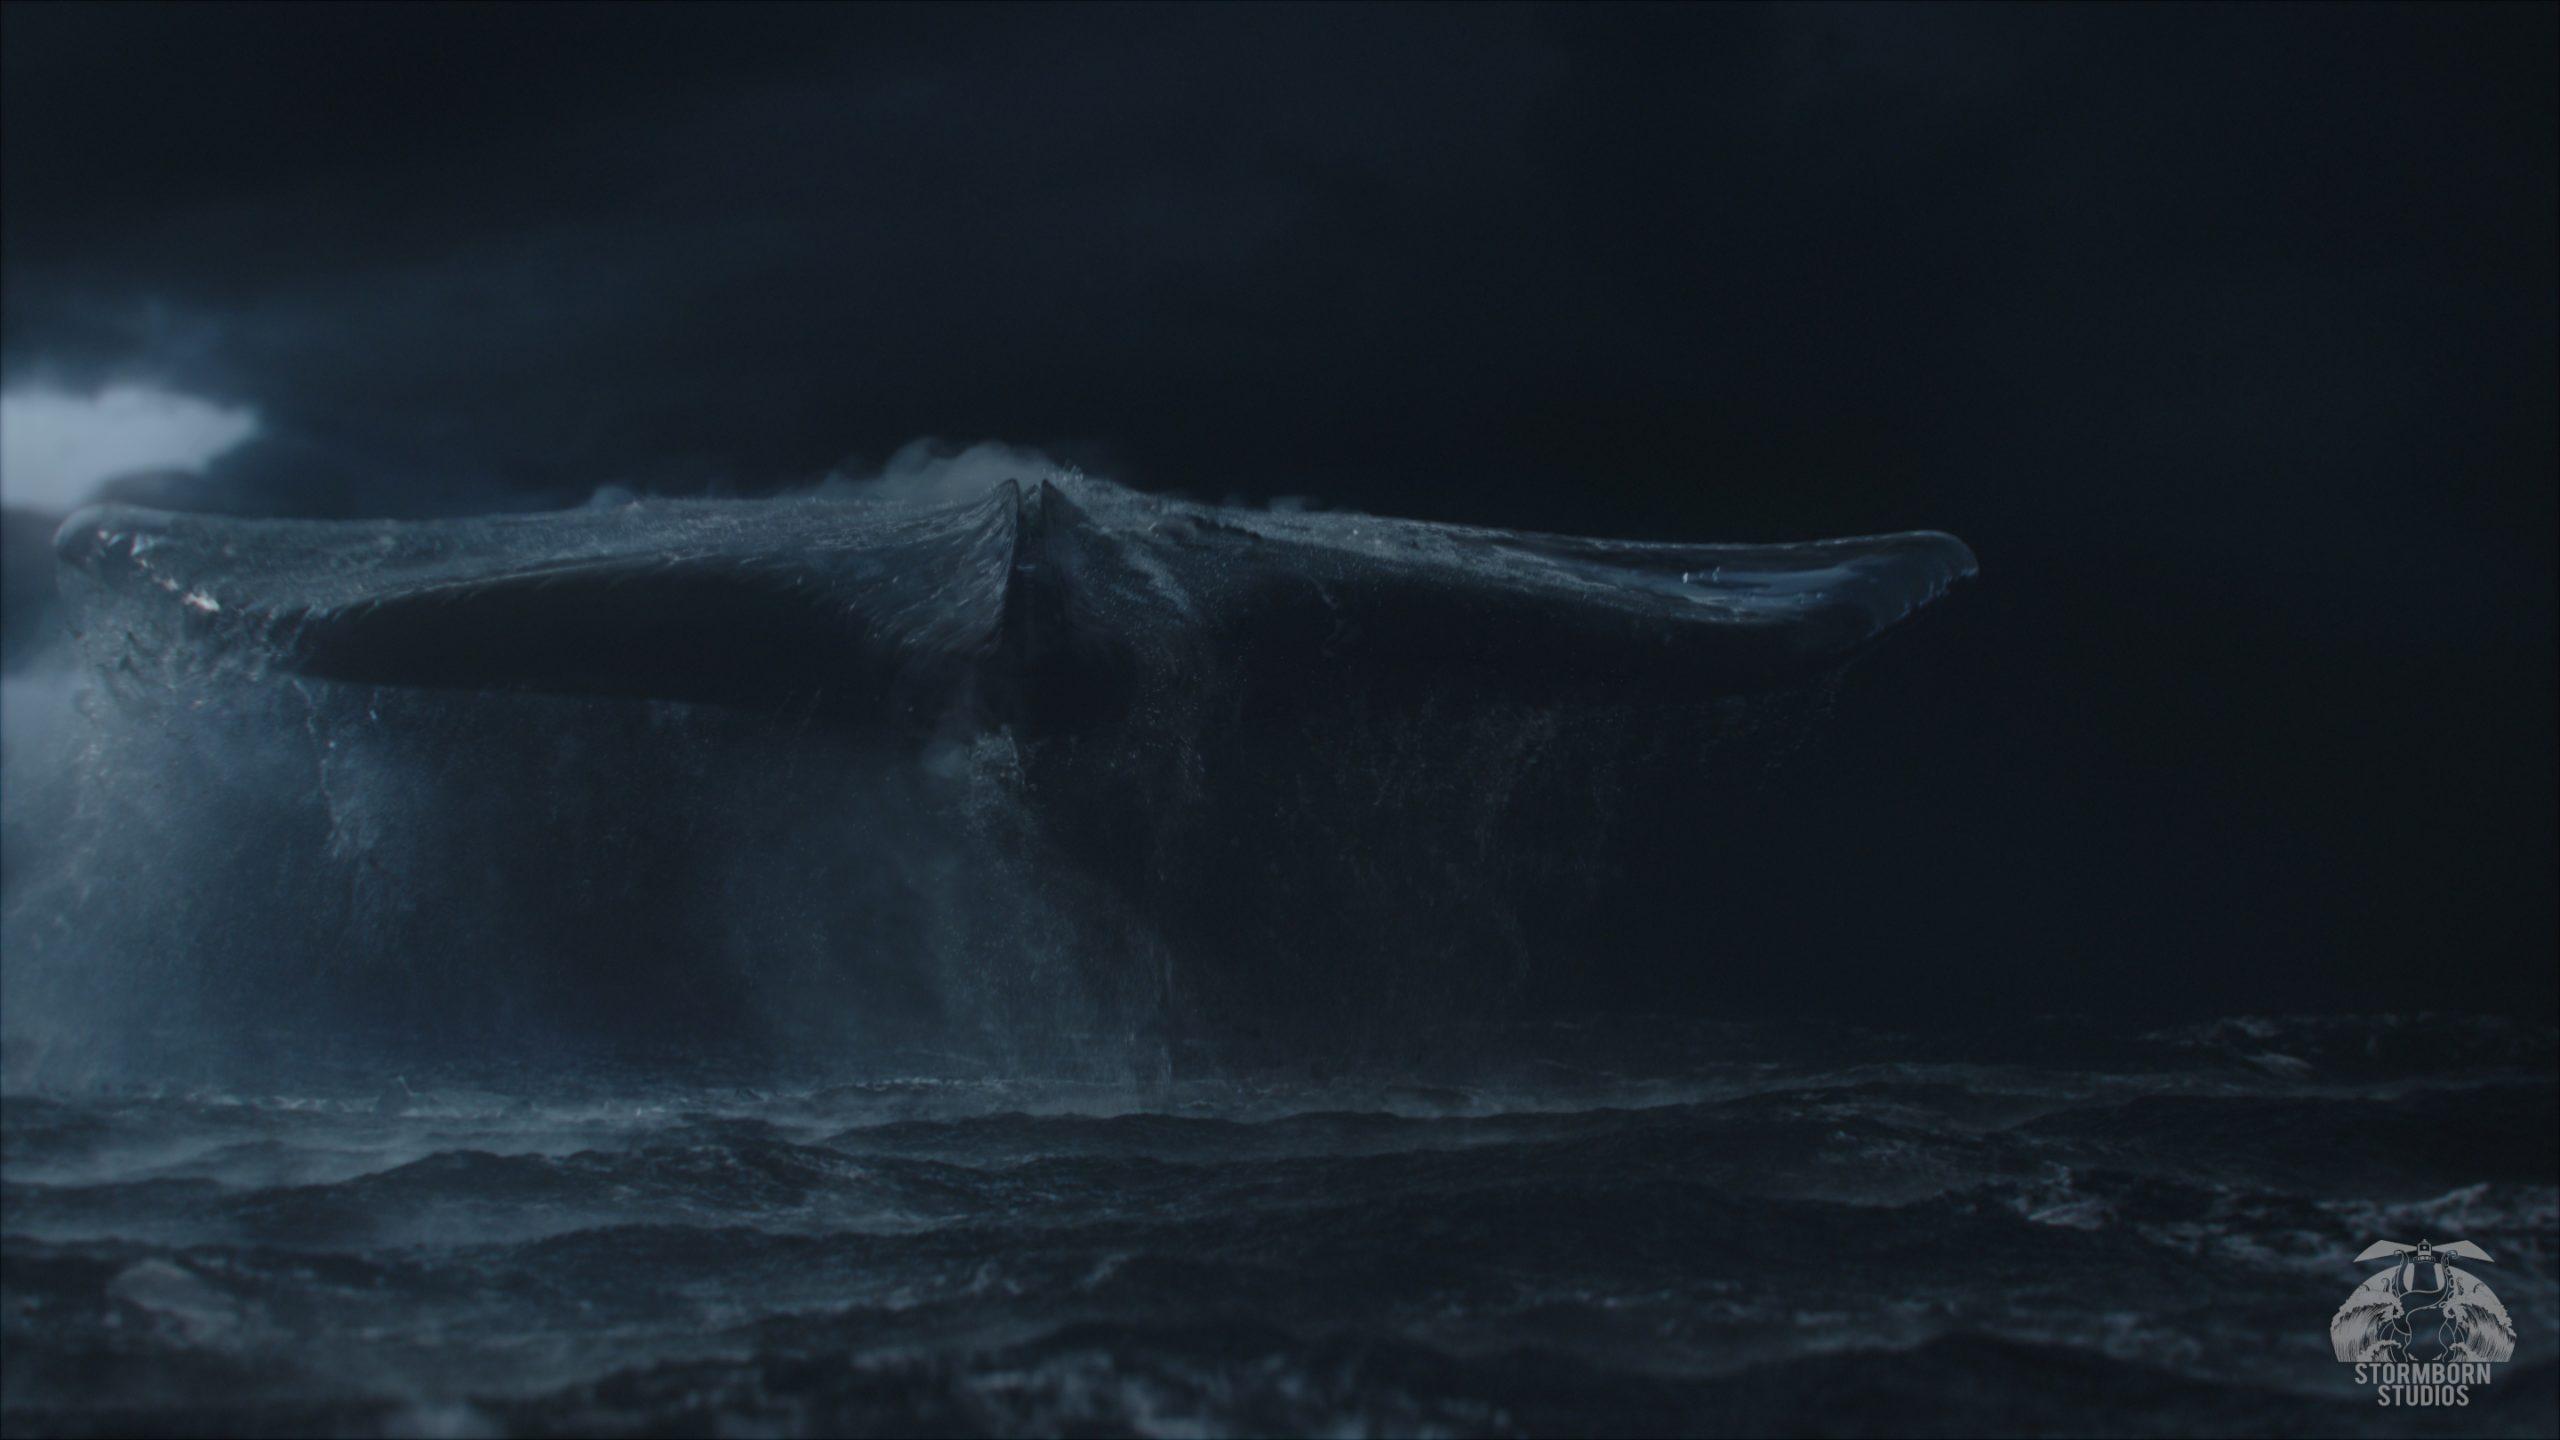 Stormborn Studios UFO above ocean